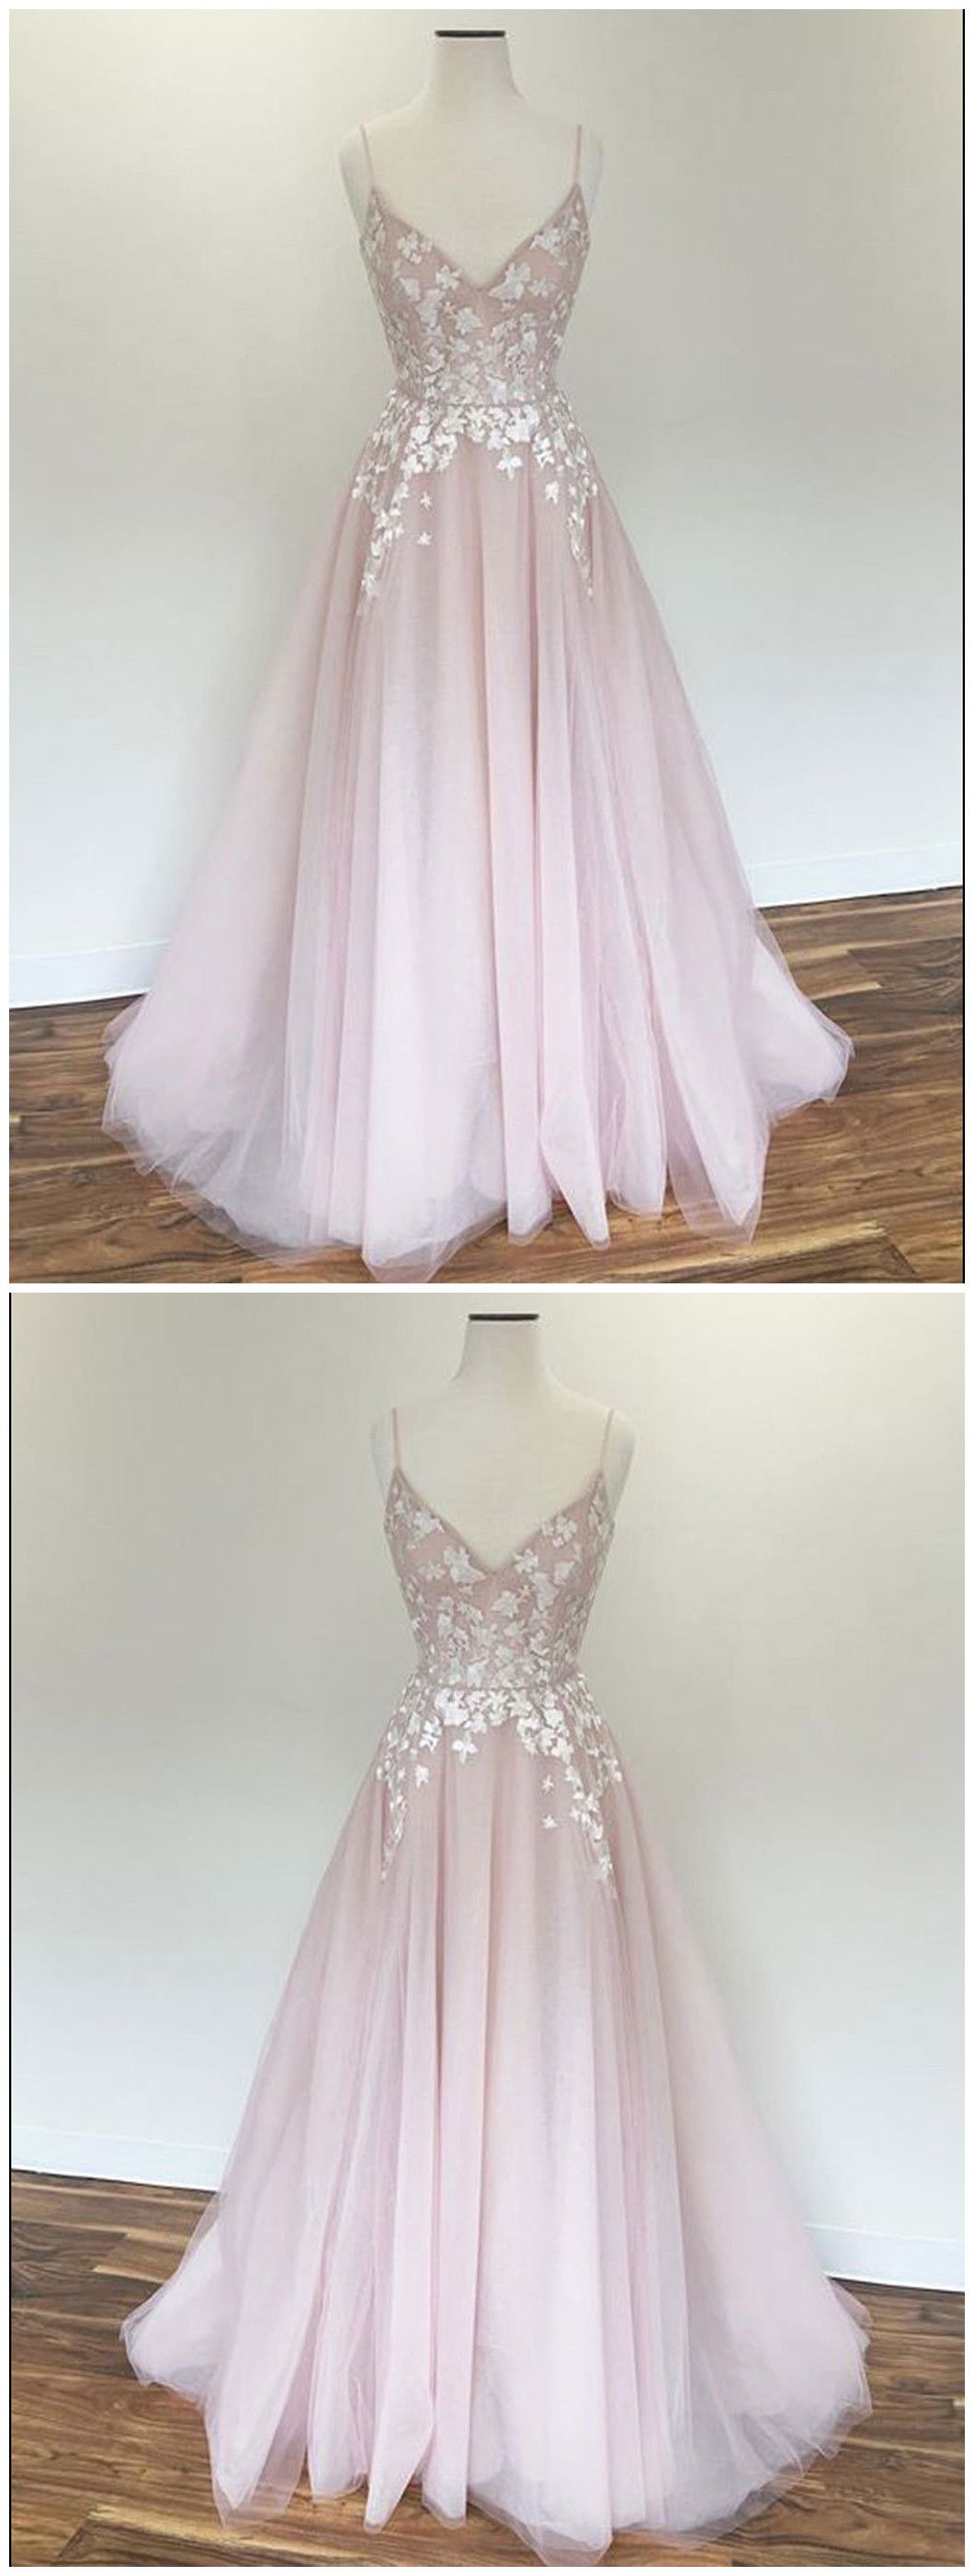 Spaghetti straps prom dress aline pink applique modest long prom